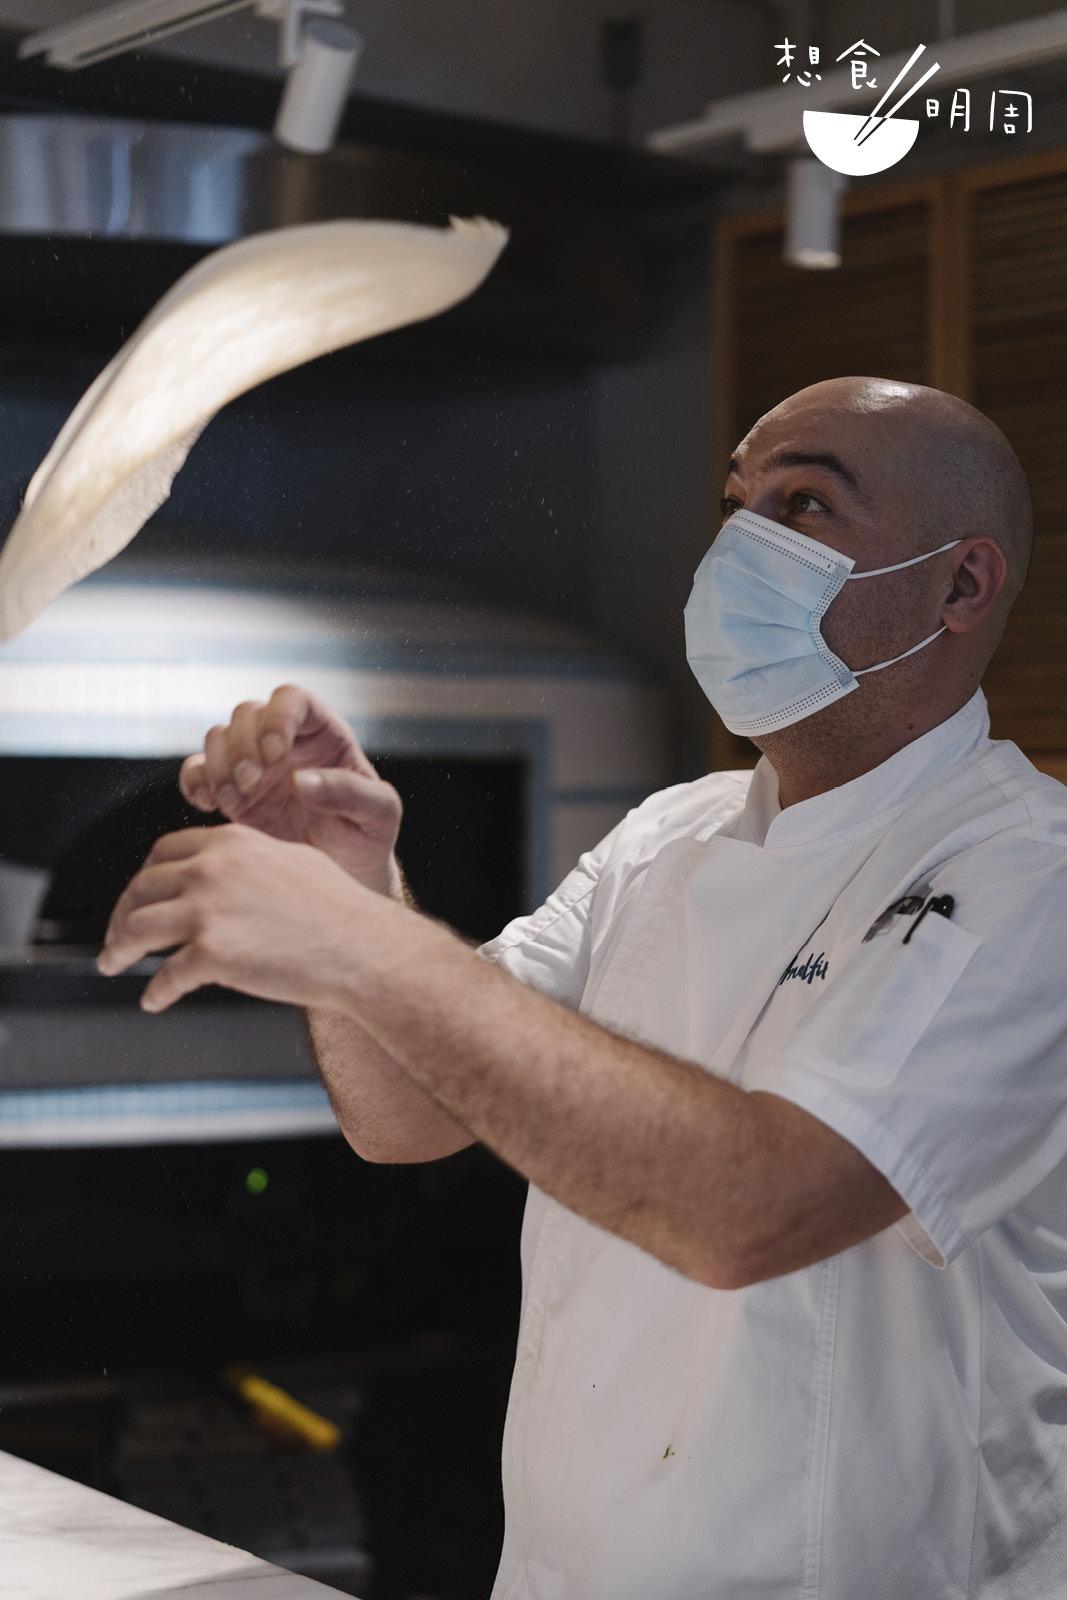 Chef Michel認為「空中開皮」只是一種表演,讓客人看得開心而已。